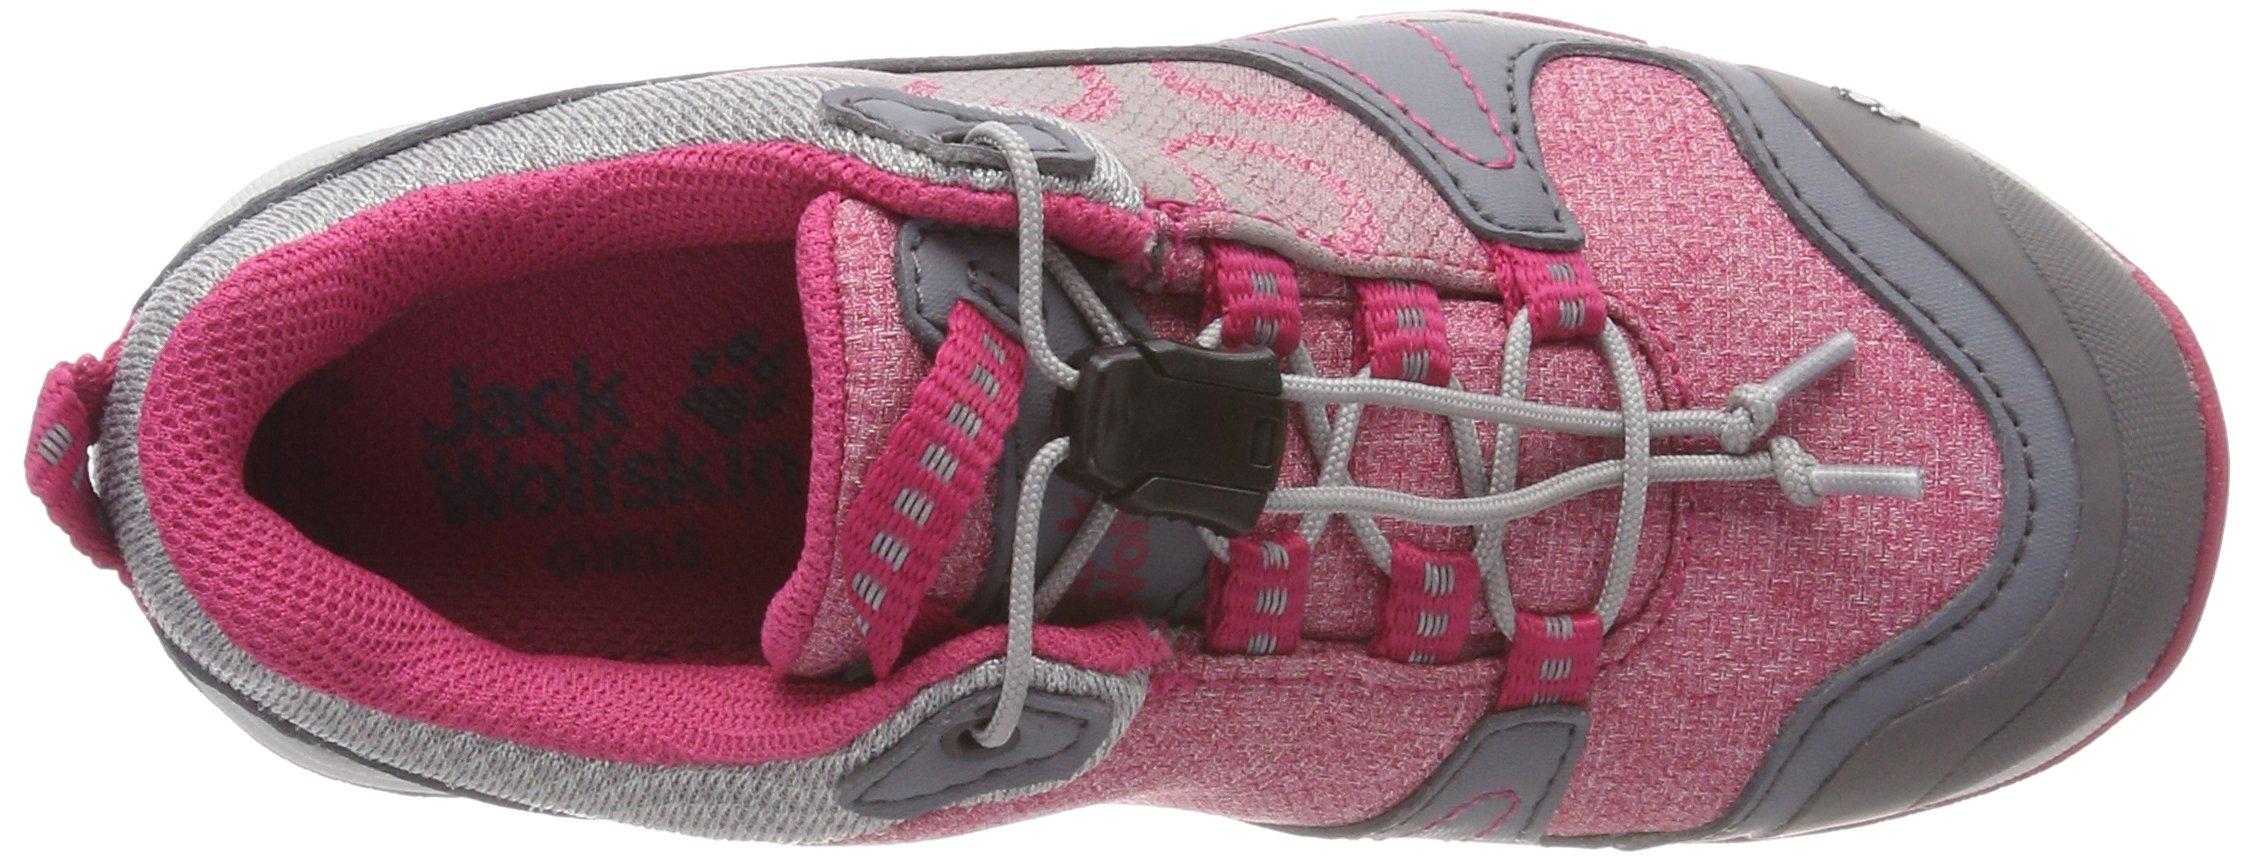 Jack Wolfskin Girls Grivla Texapore Low G Wasserdicht Rise Hiking Shoes 7